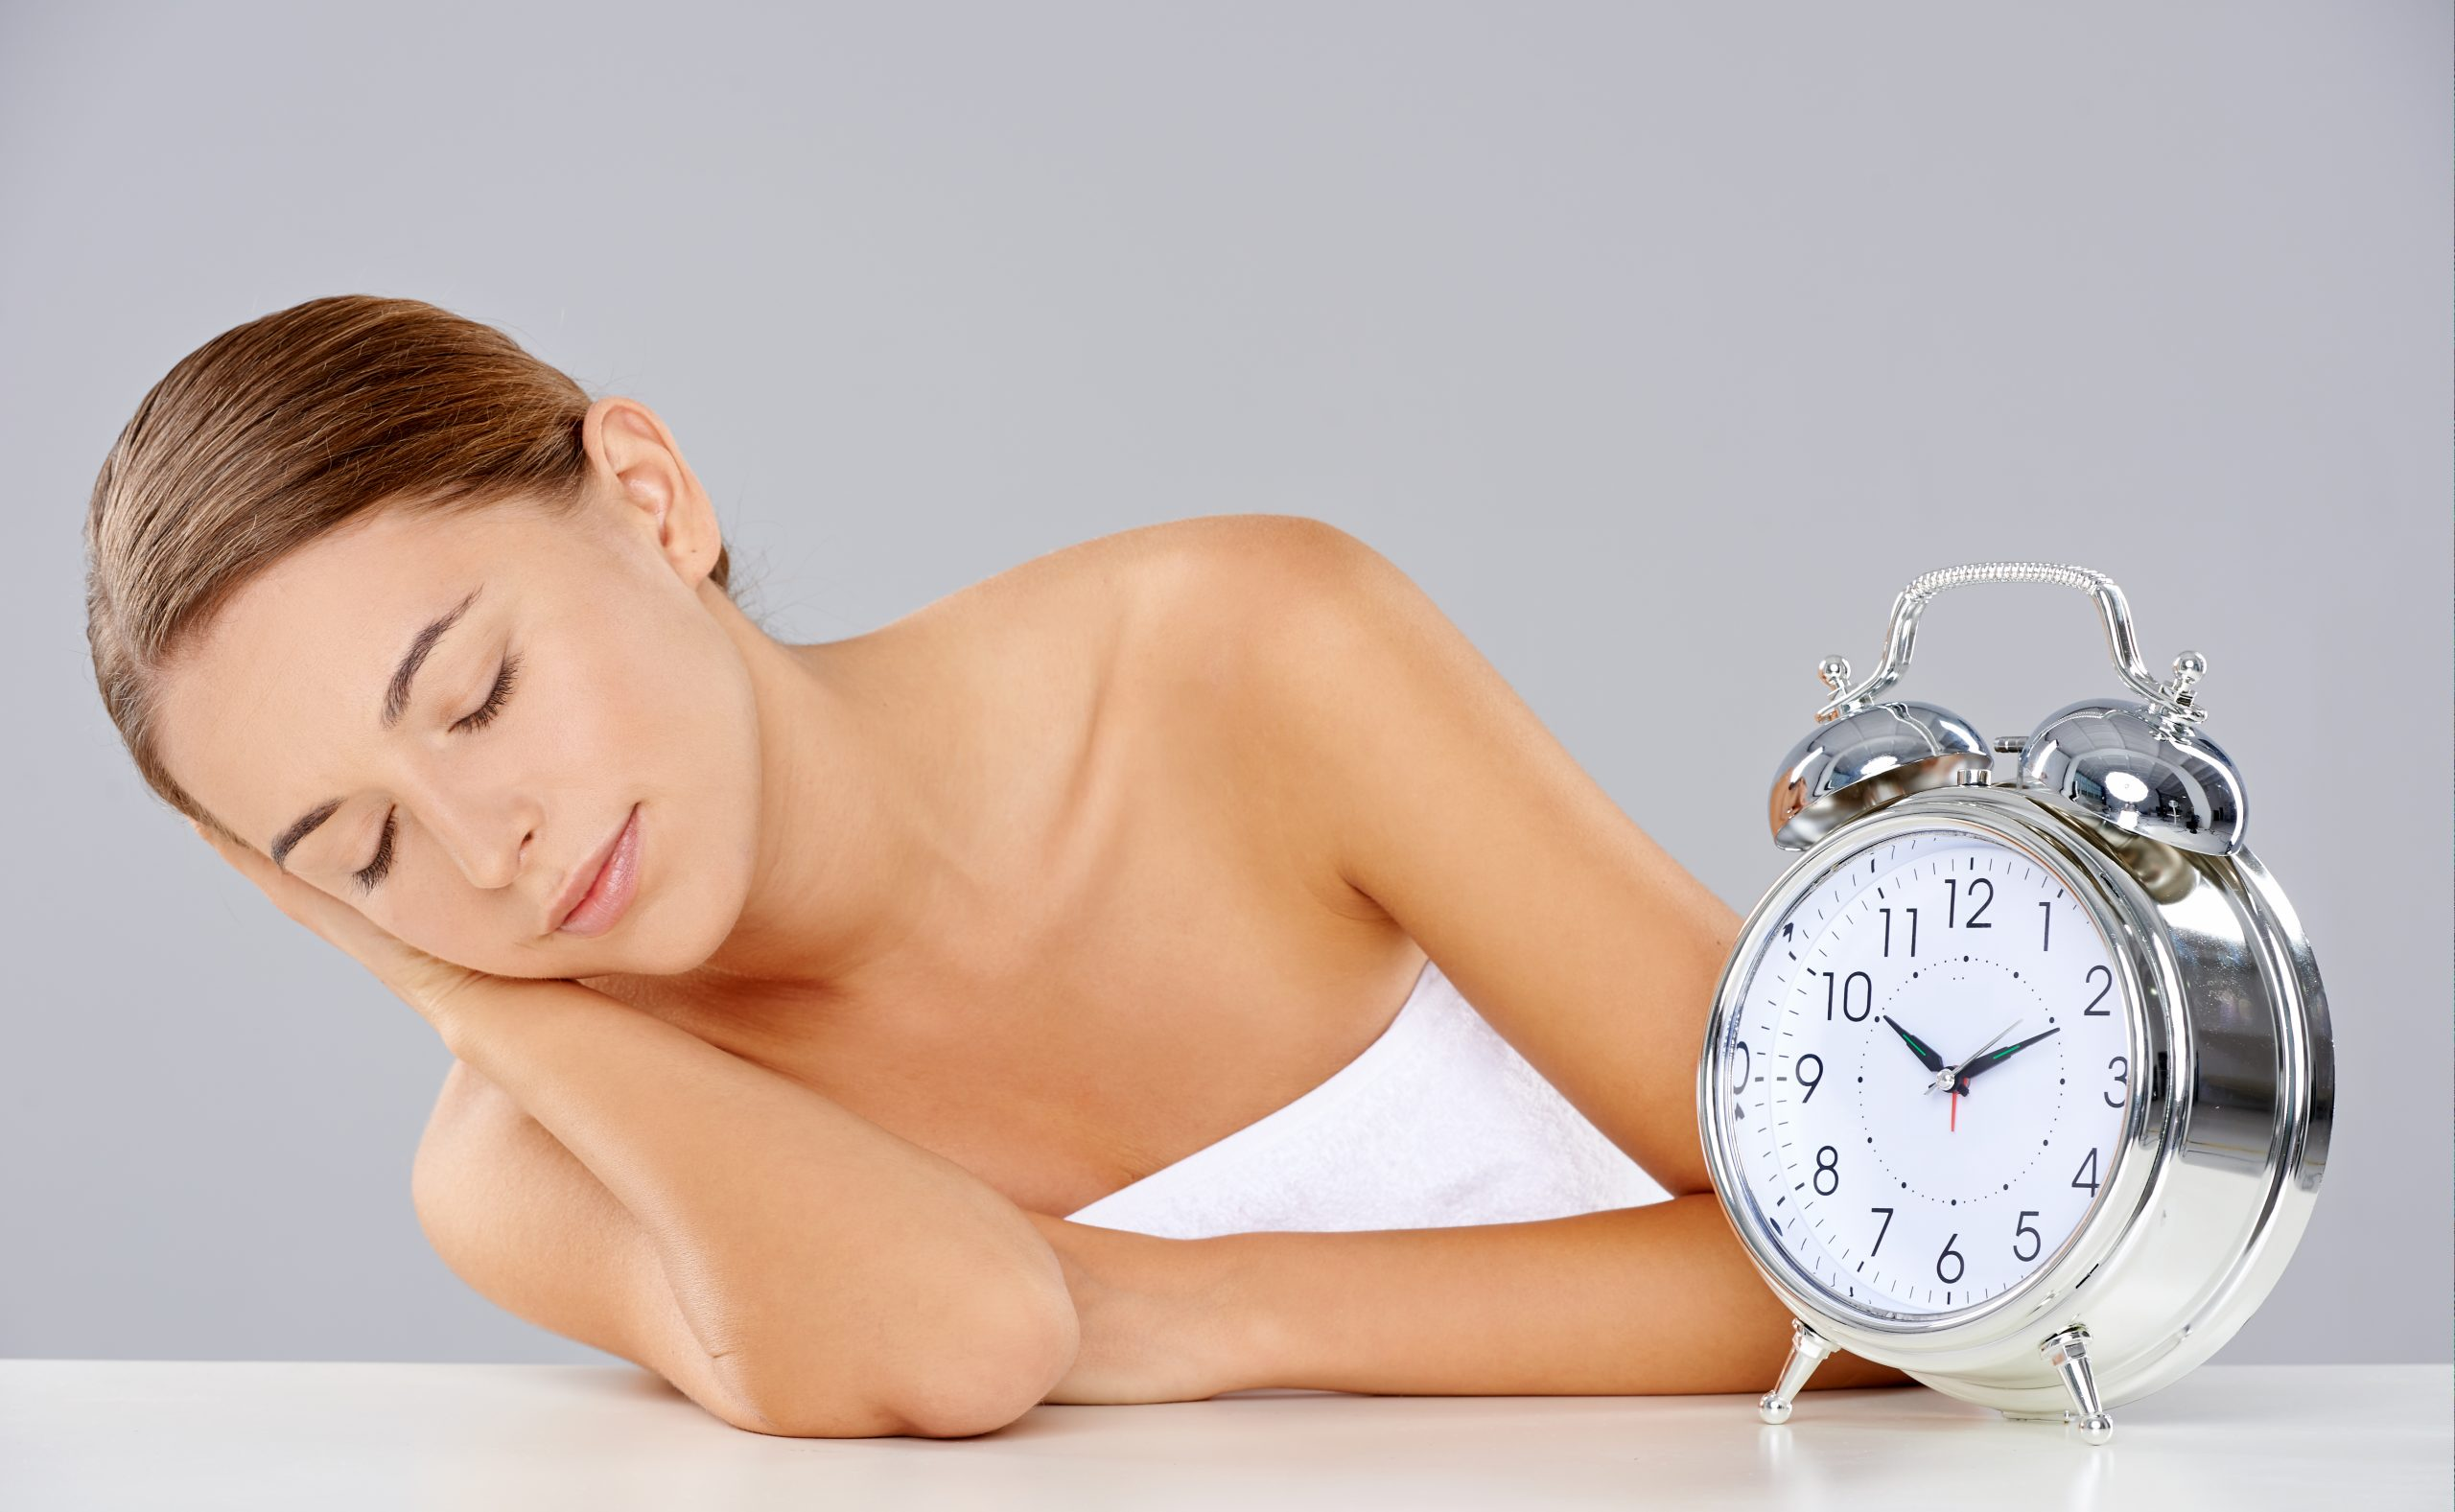 Woman sleeping alongside an alarm clock